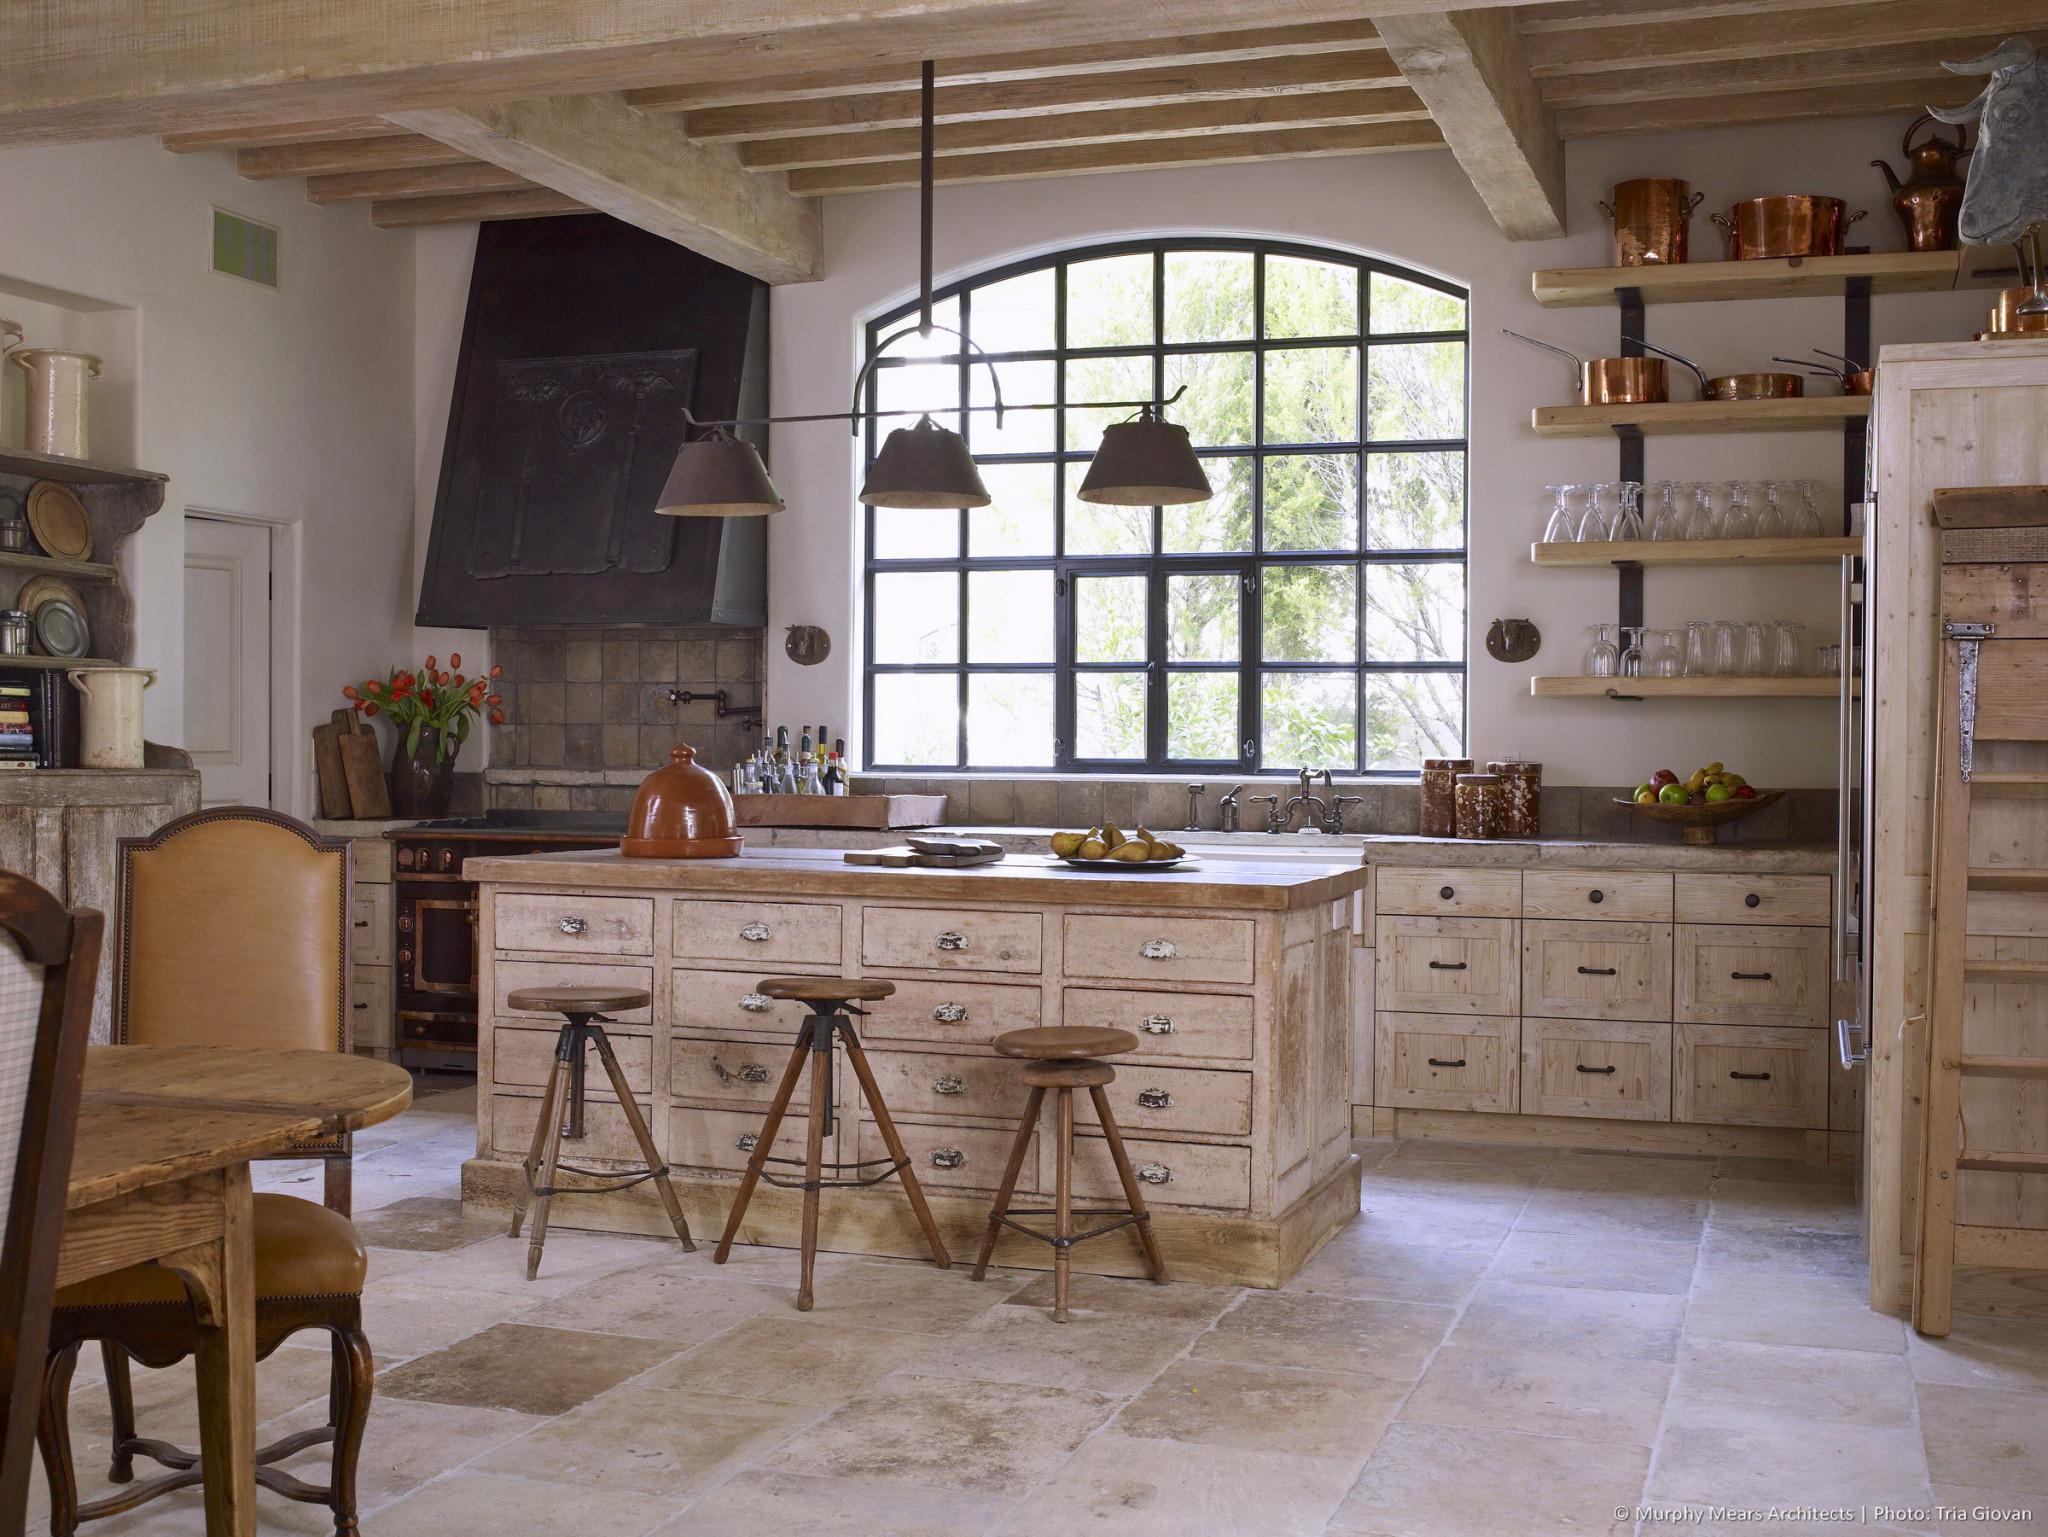 w-bridge-house-kitchen